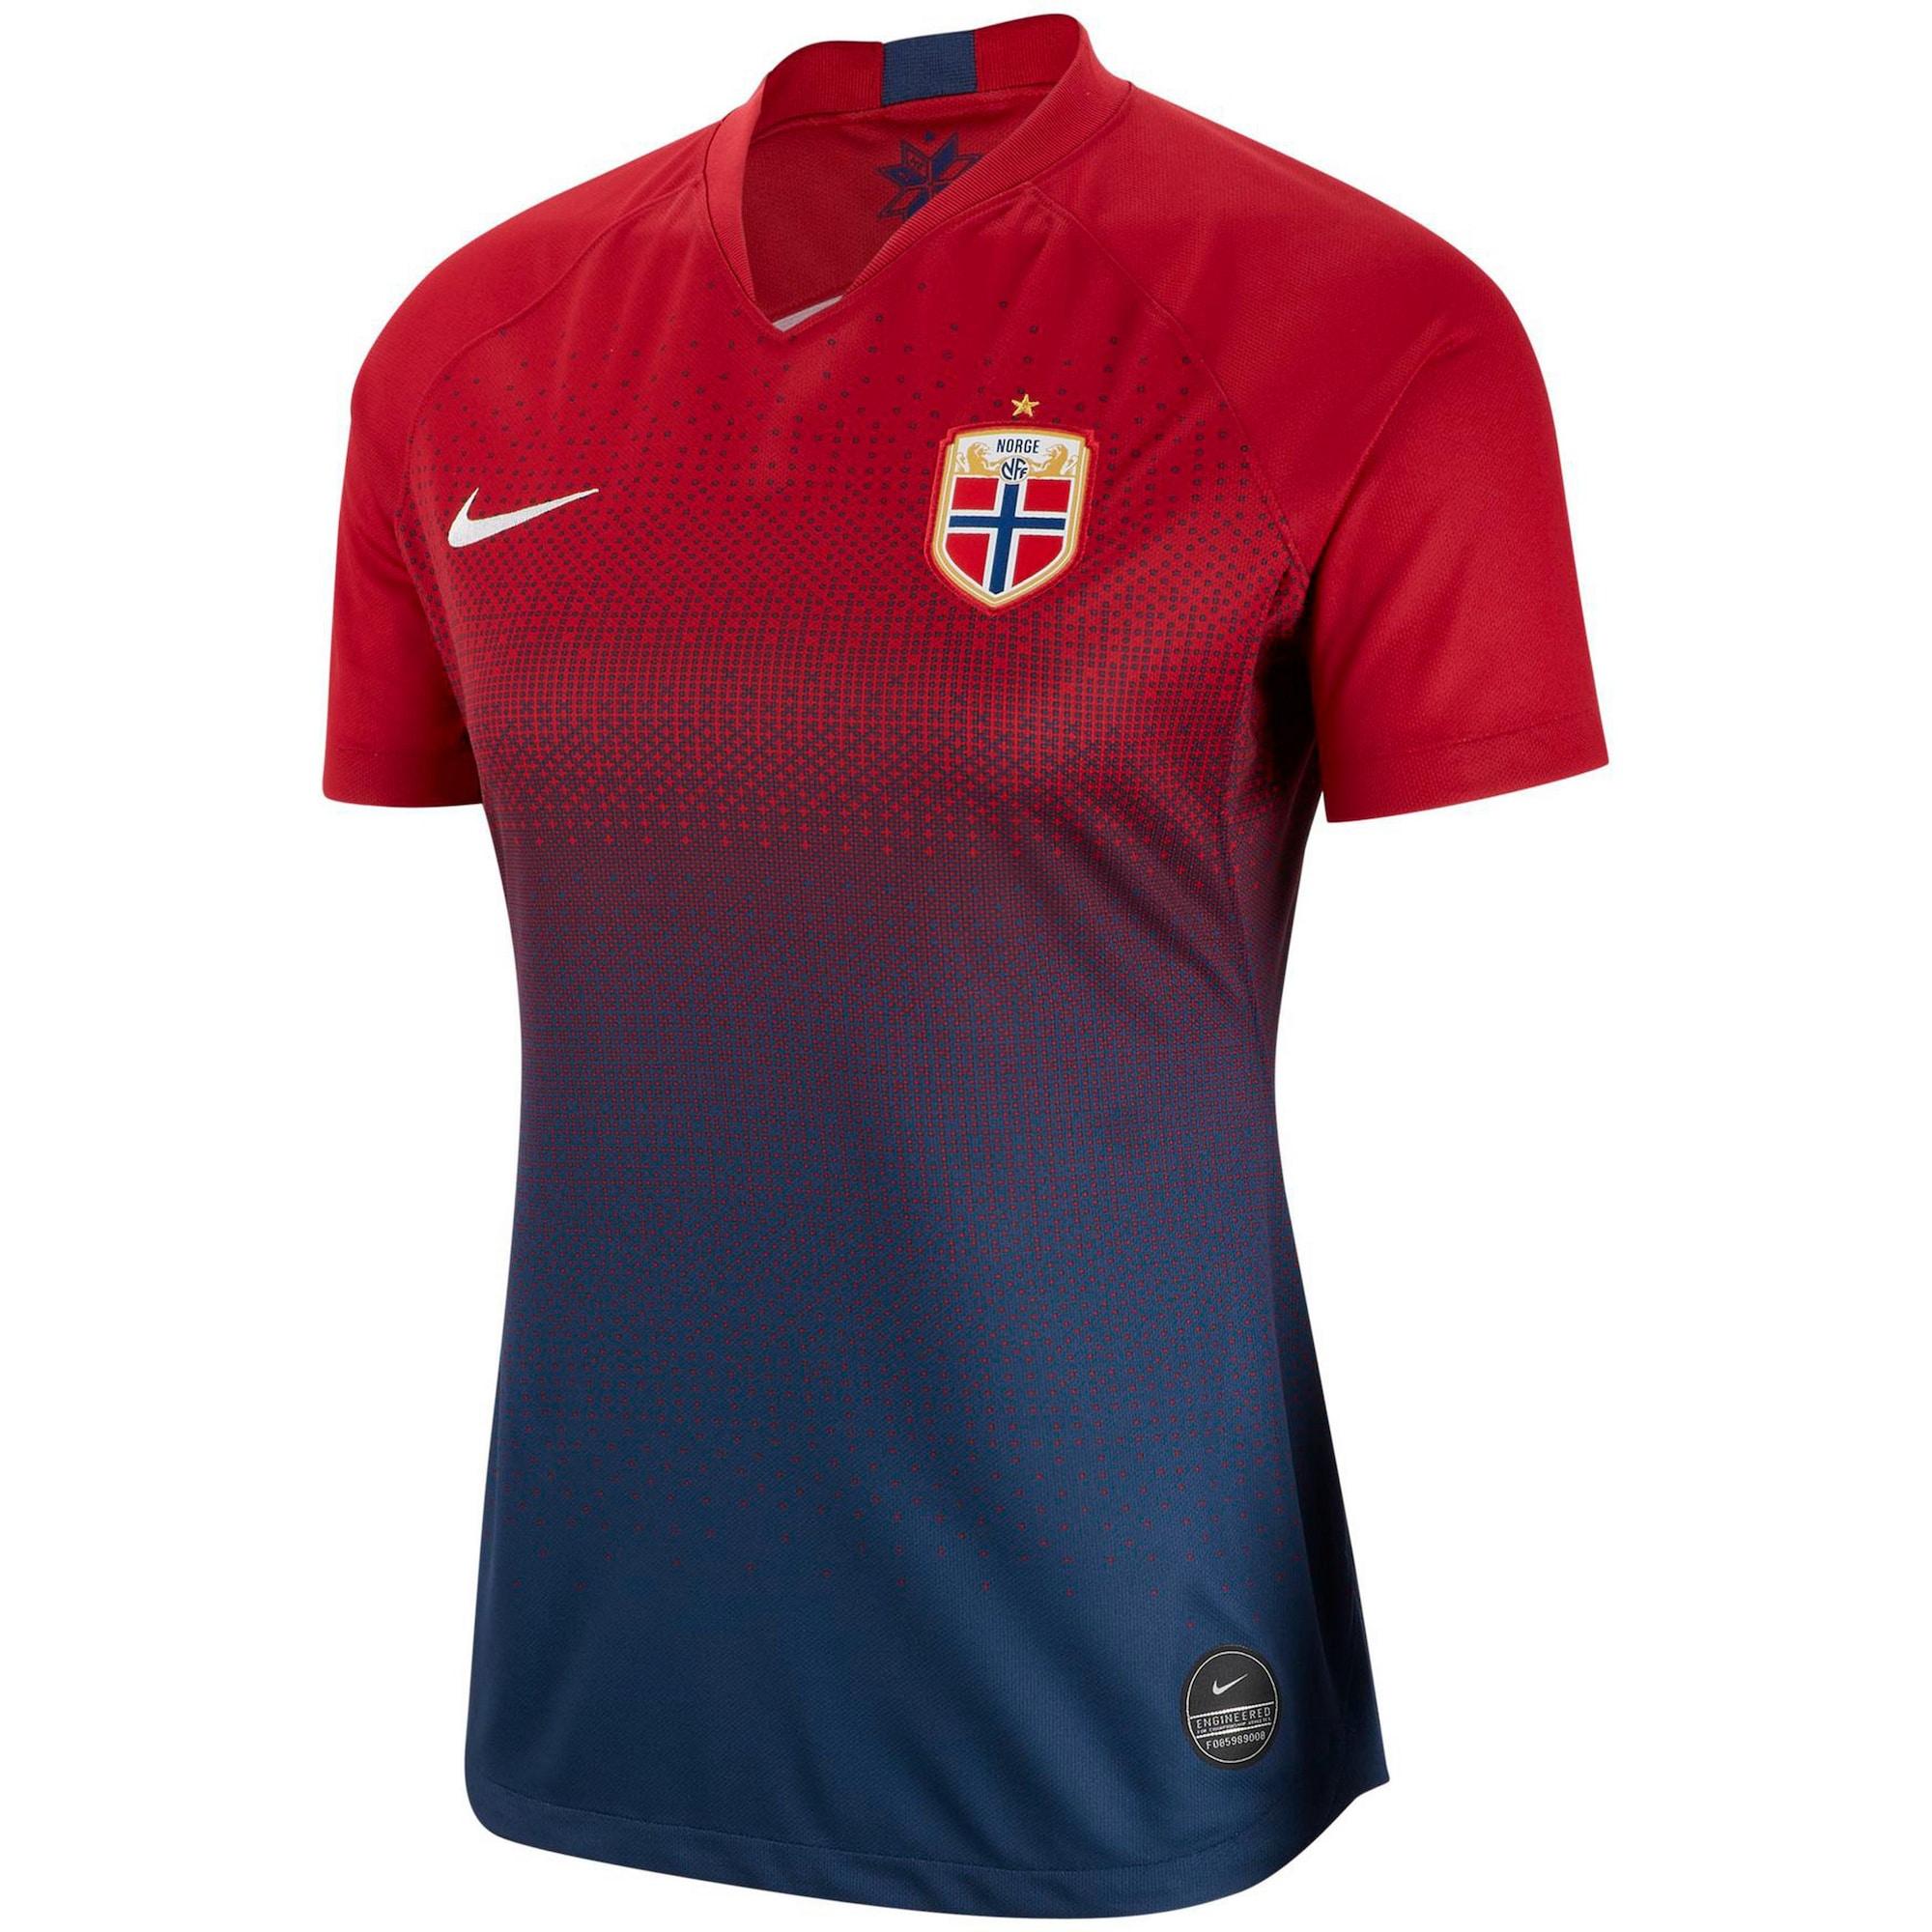 Fußballtrikot 'Norwegen 2019 Heim' | Sportbekleidung > Trikots > Fußballtrikots | Dunkelblau - Rot | Nike